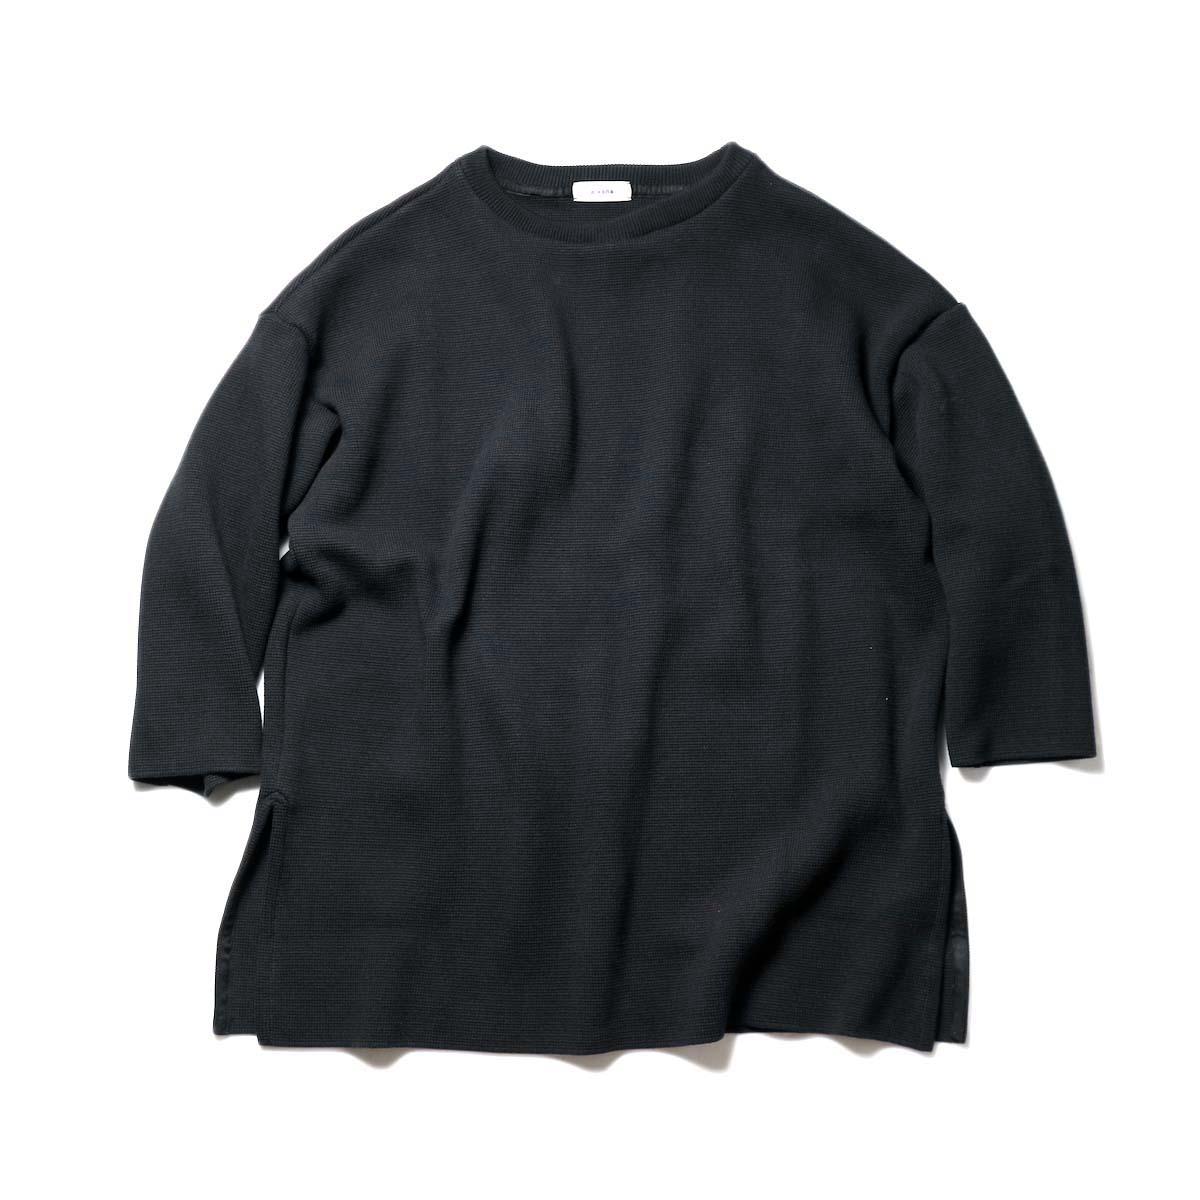 alvana / MILANO 2WAY TUNIC P.O (Black)正面②